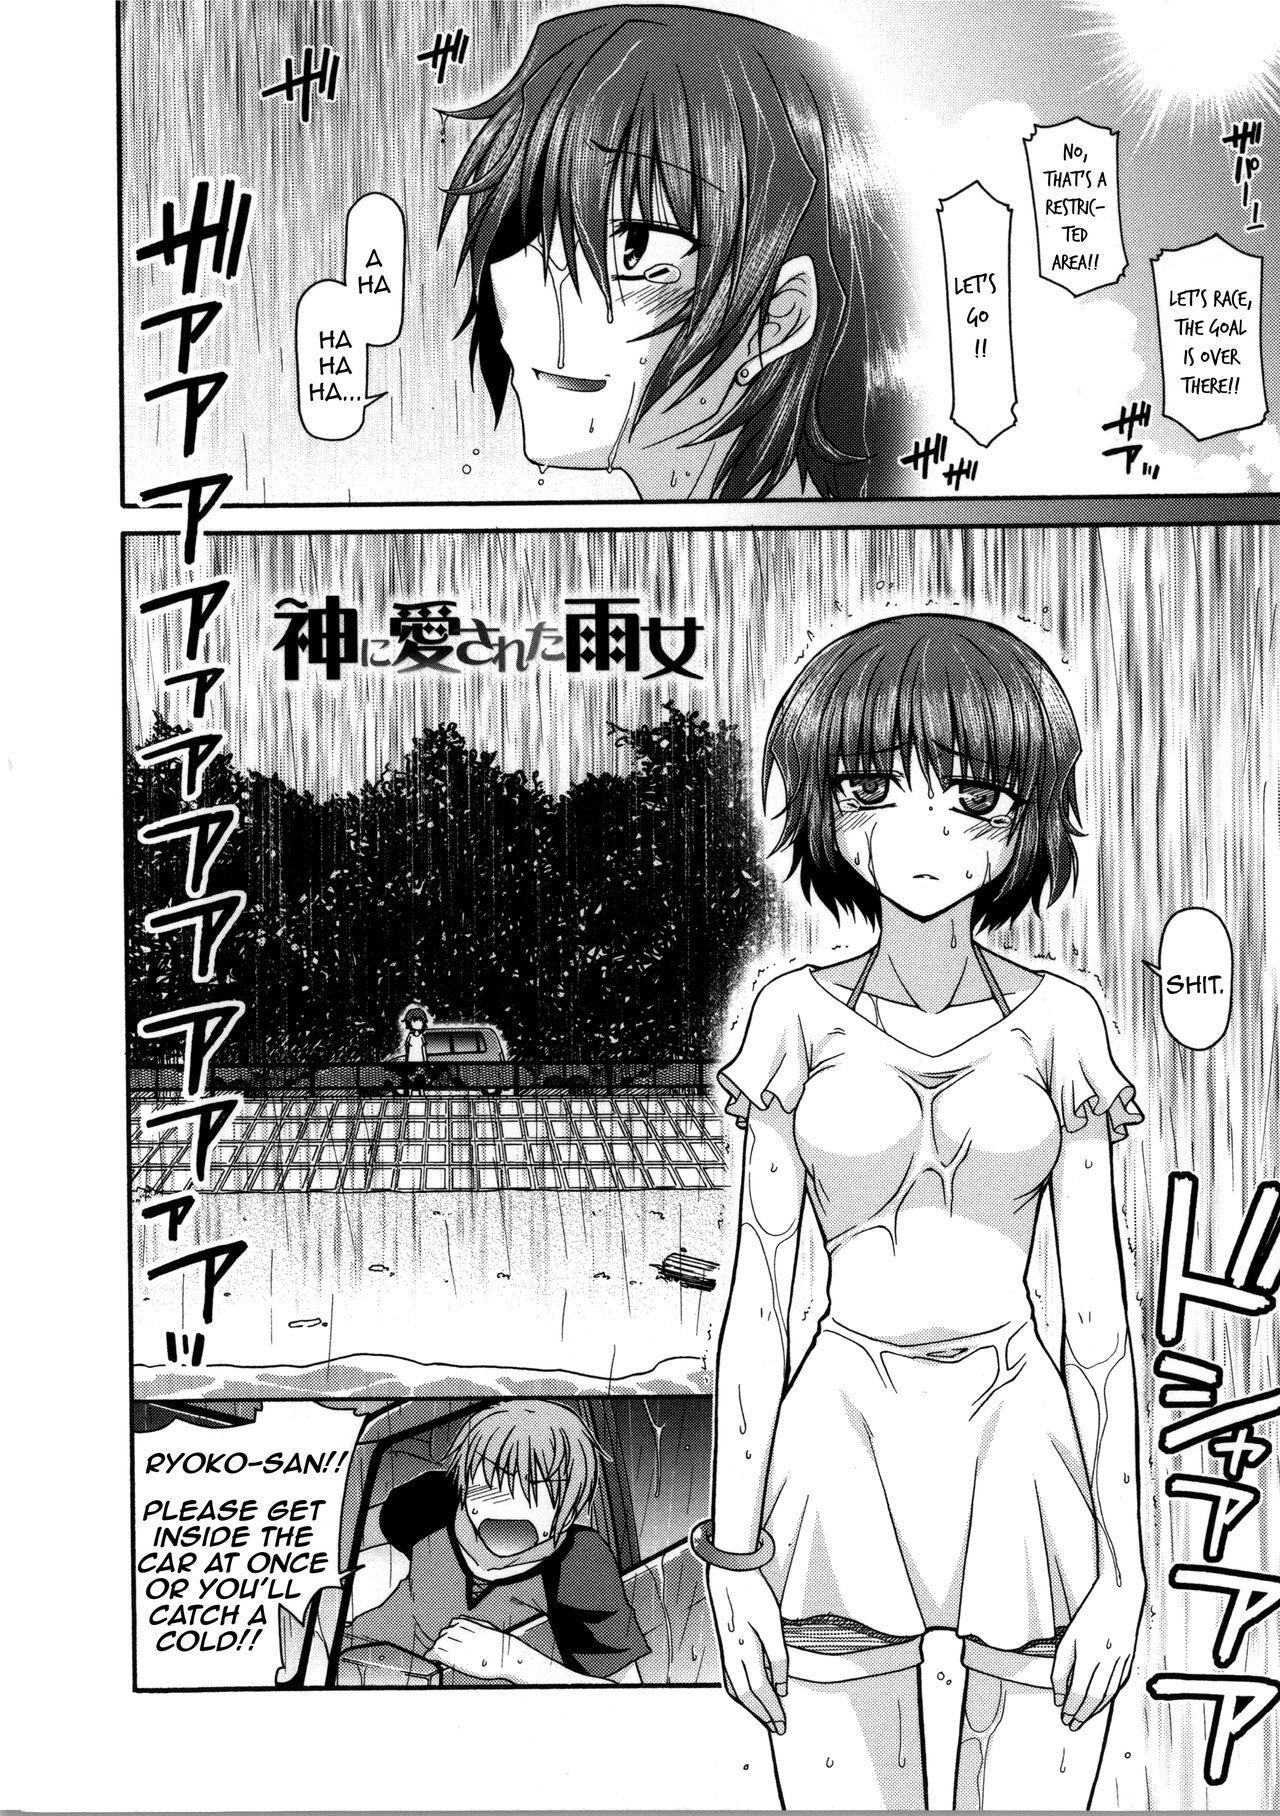 [Miyashiro Sousuke] Yamato Nadeshiko Chichi Henge - Yamato Nadeshiko Breast Changes Ch. 0-1, 4-5, 7-9 [English] 6